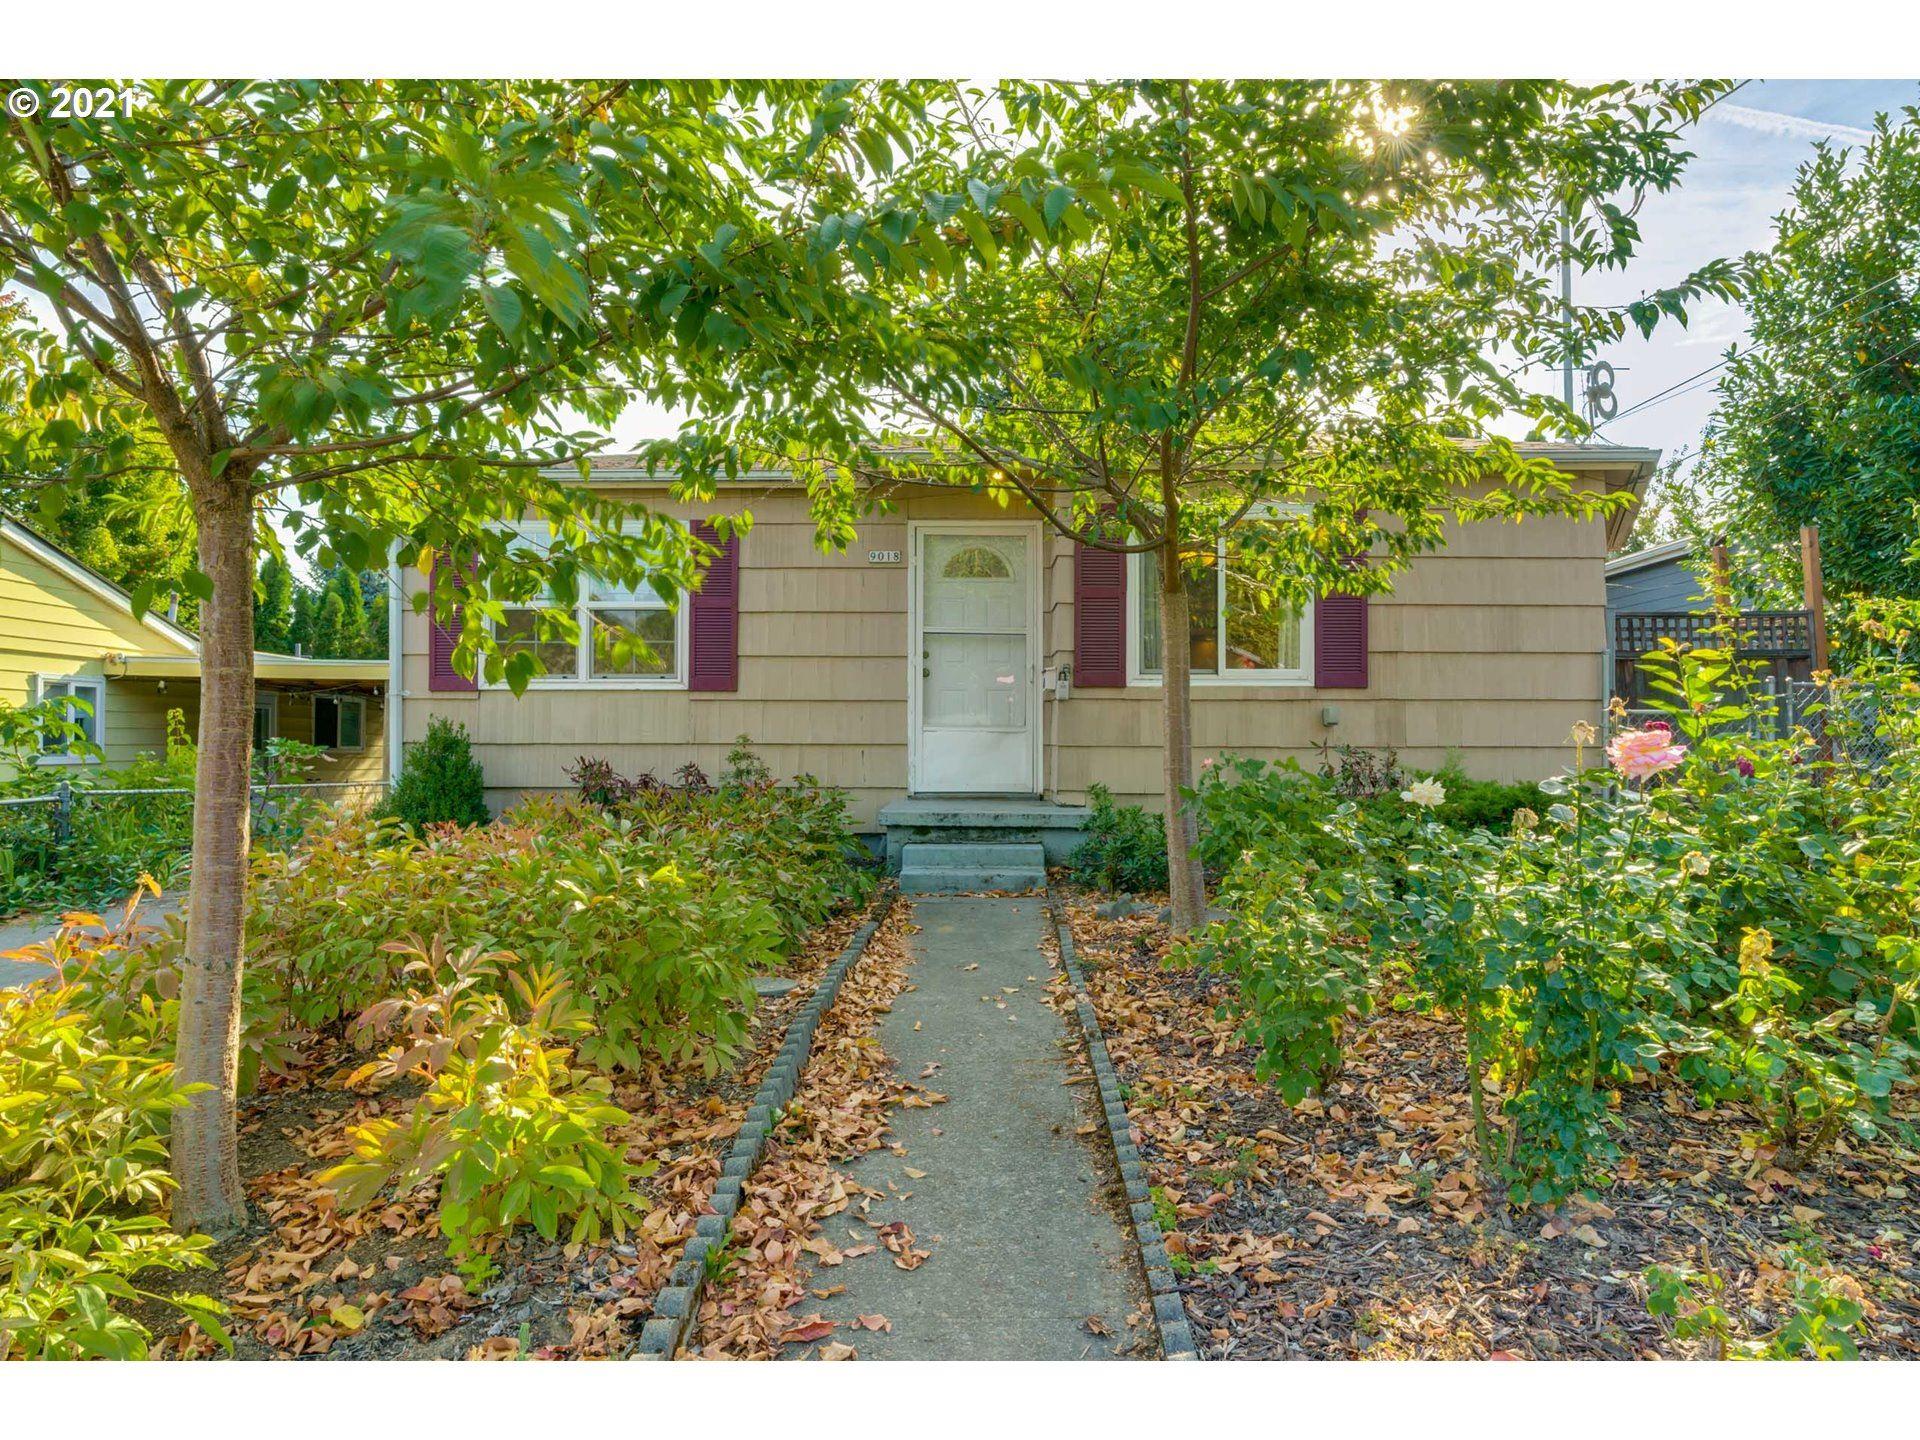 9018 N PENINSULAR AVE, Portland, OR 97217 - MLS#: 21092532